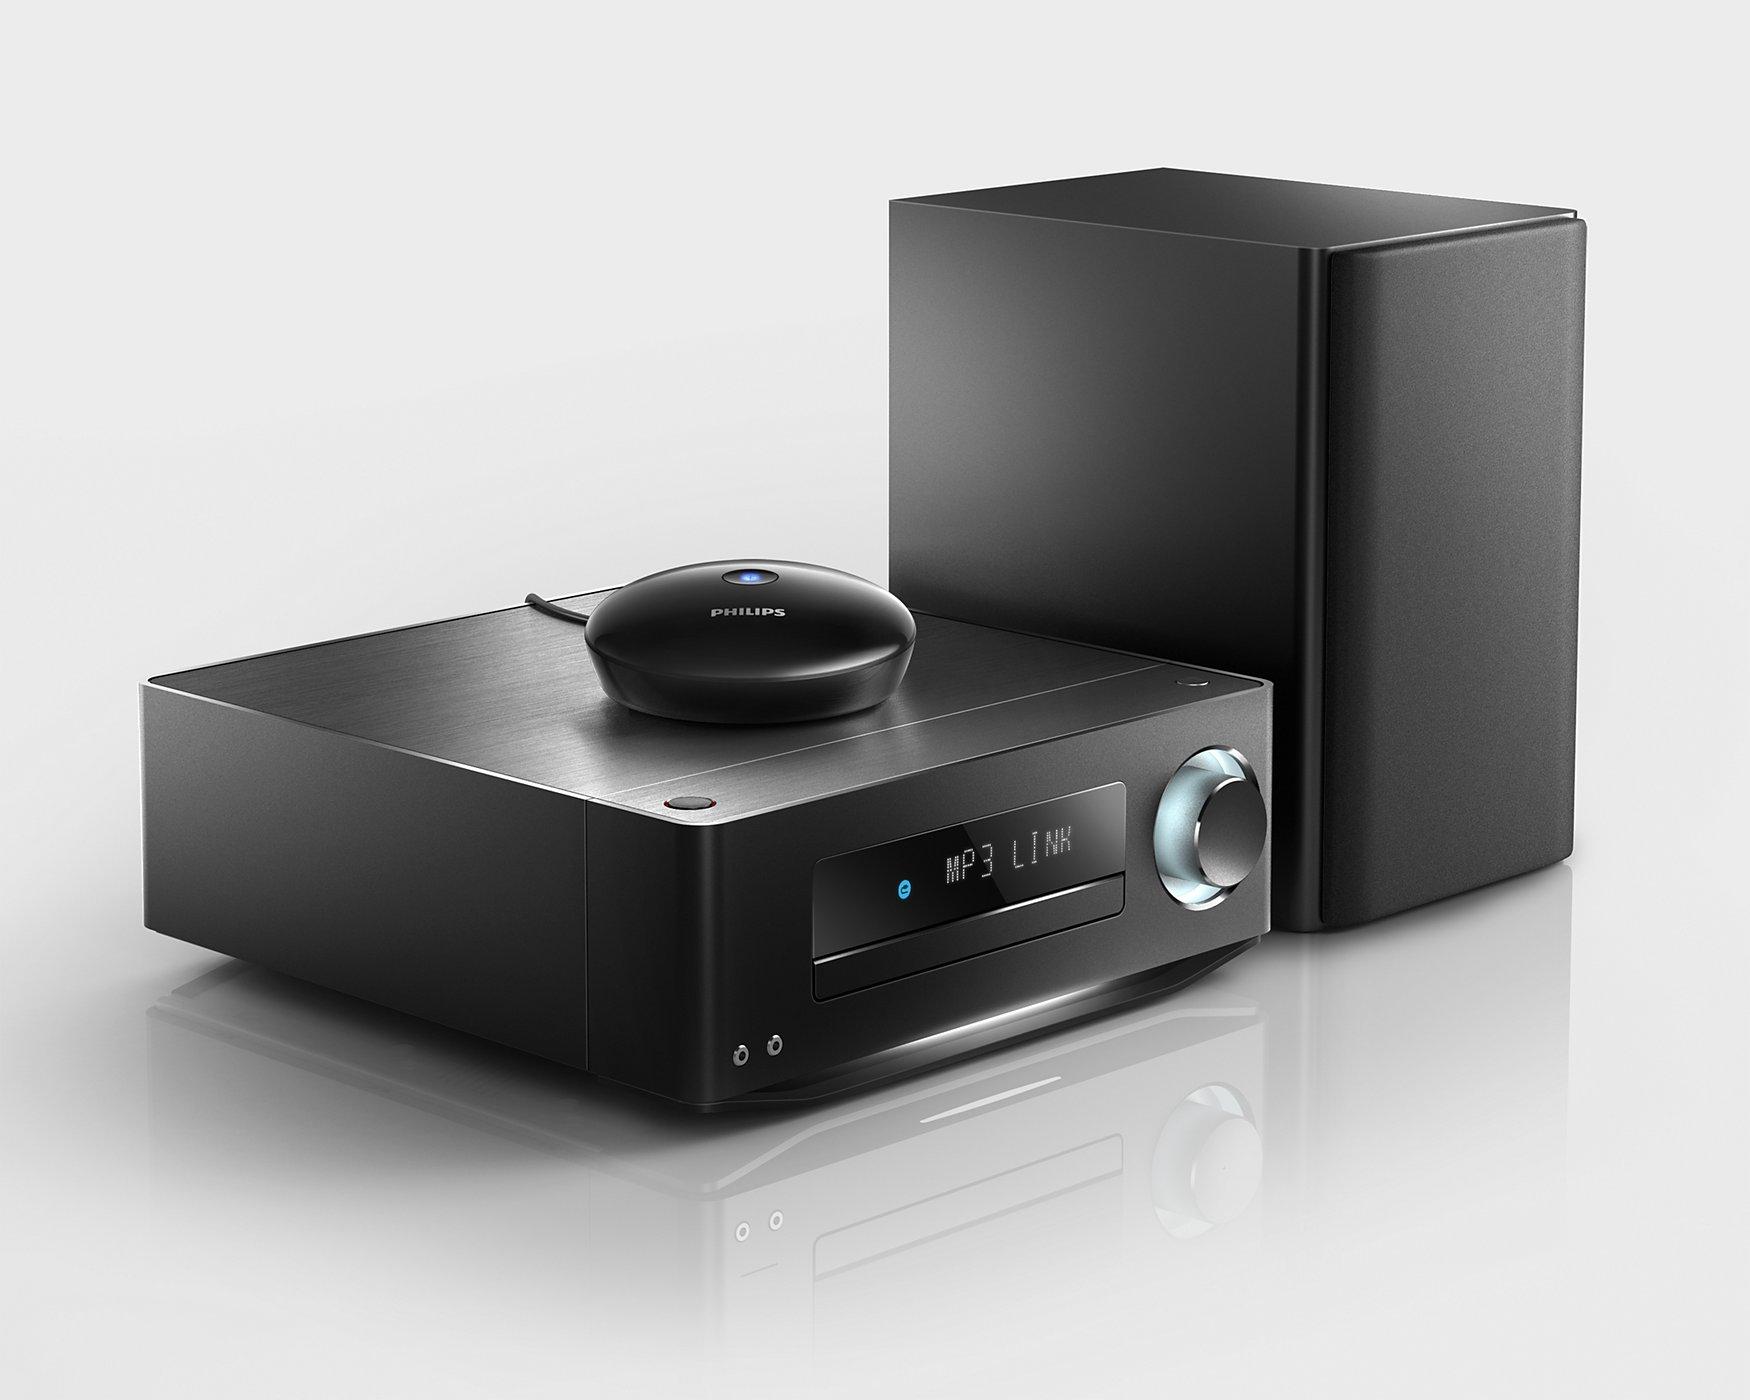 Philips Bluetooth Adapter